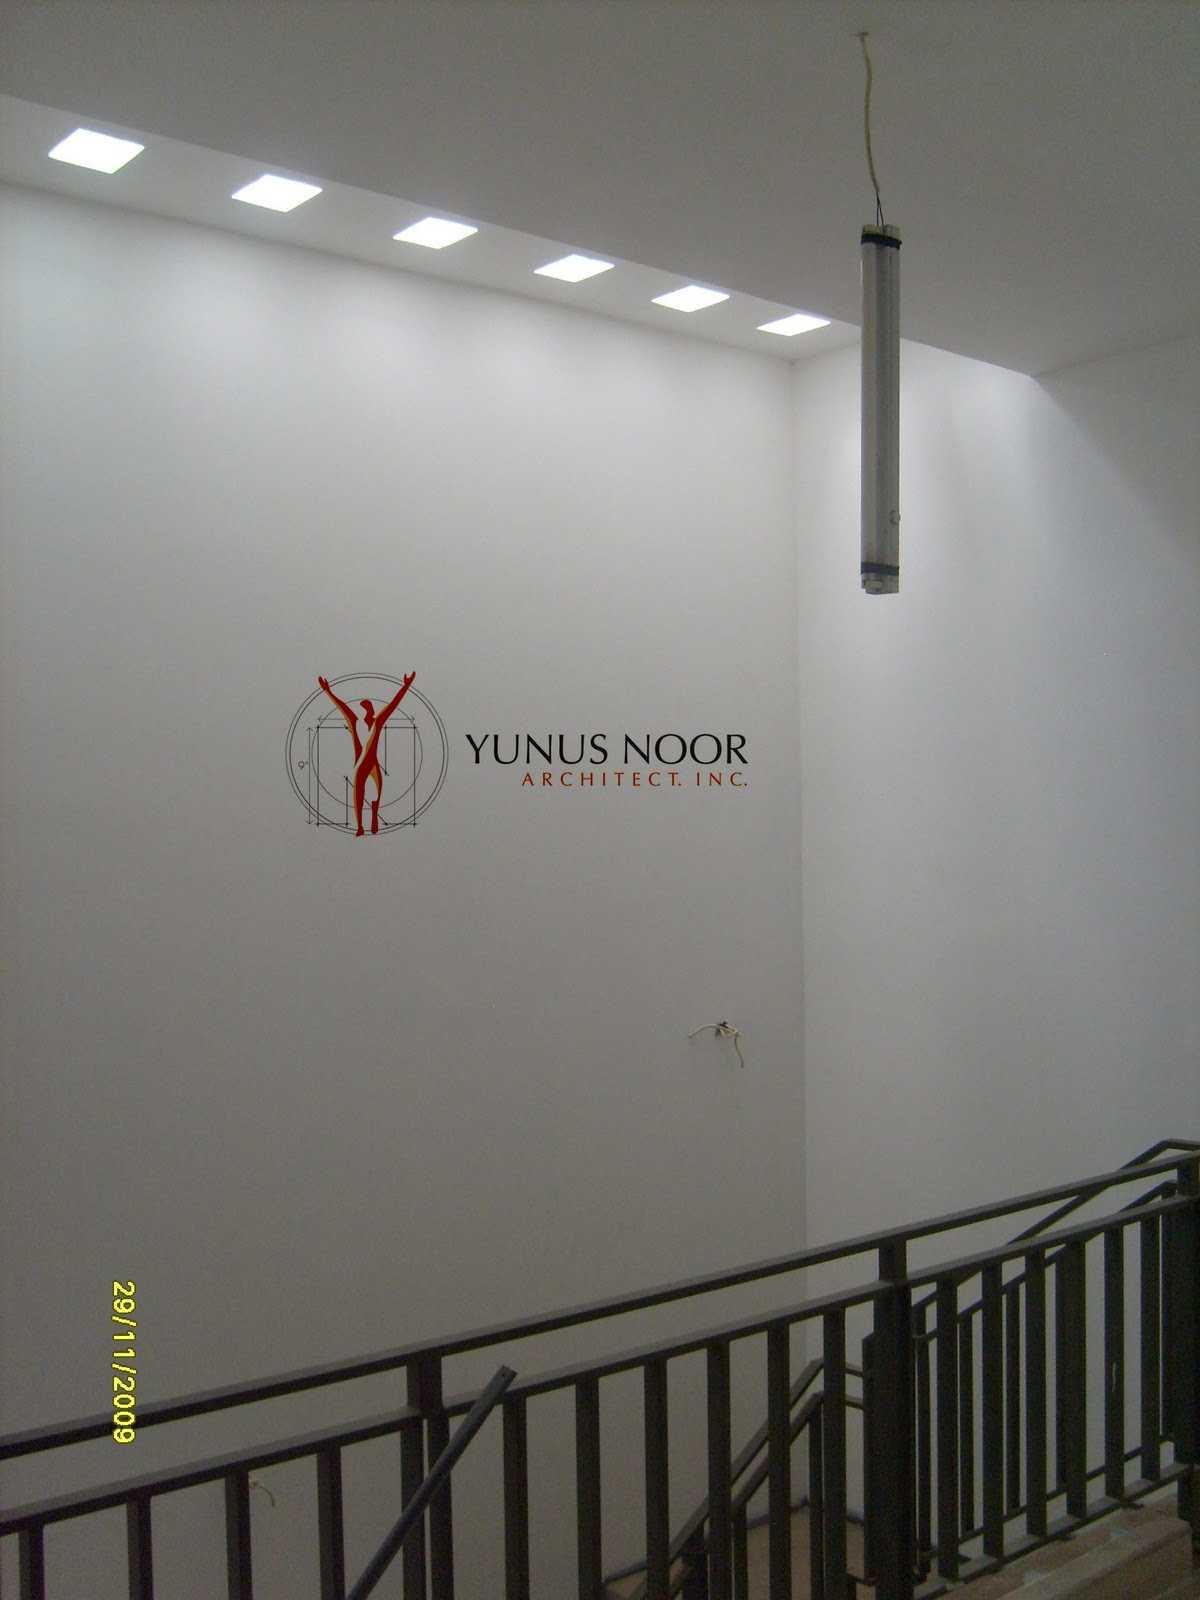 Yunus Noor Capt. Lalu House Jalan Raya Pondok Gede, Jatiwaringin, Pondokgede, Jatiwaringin, Pondokgede, Kota Bks, Jawa Barat 17411, Indonesia  Yunus-Noor-Capt-Lalu-House   54935